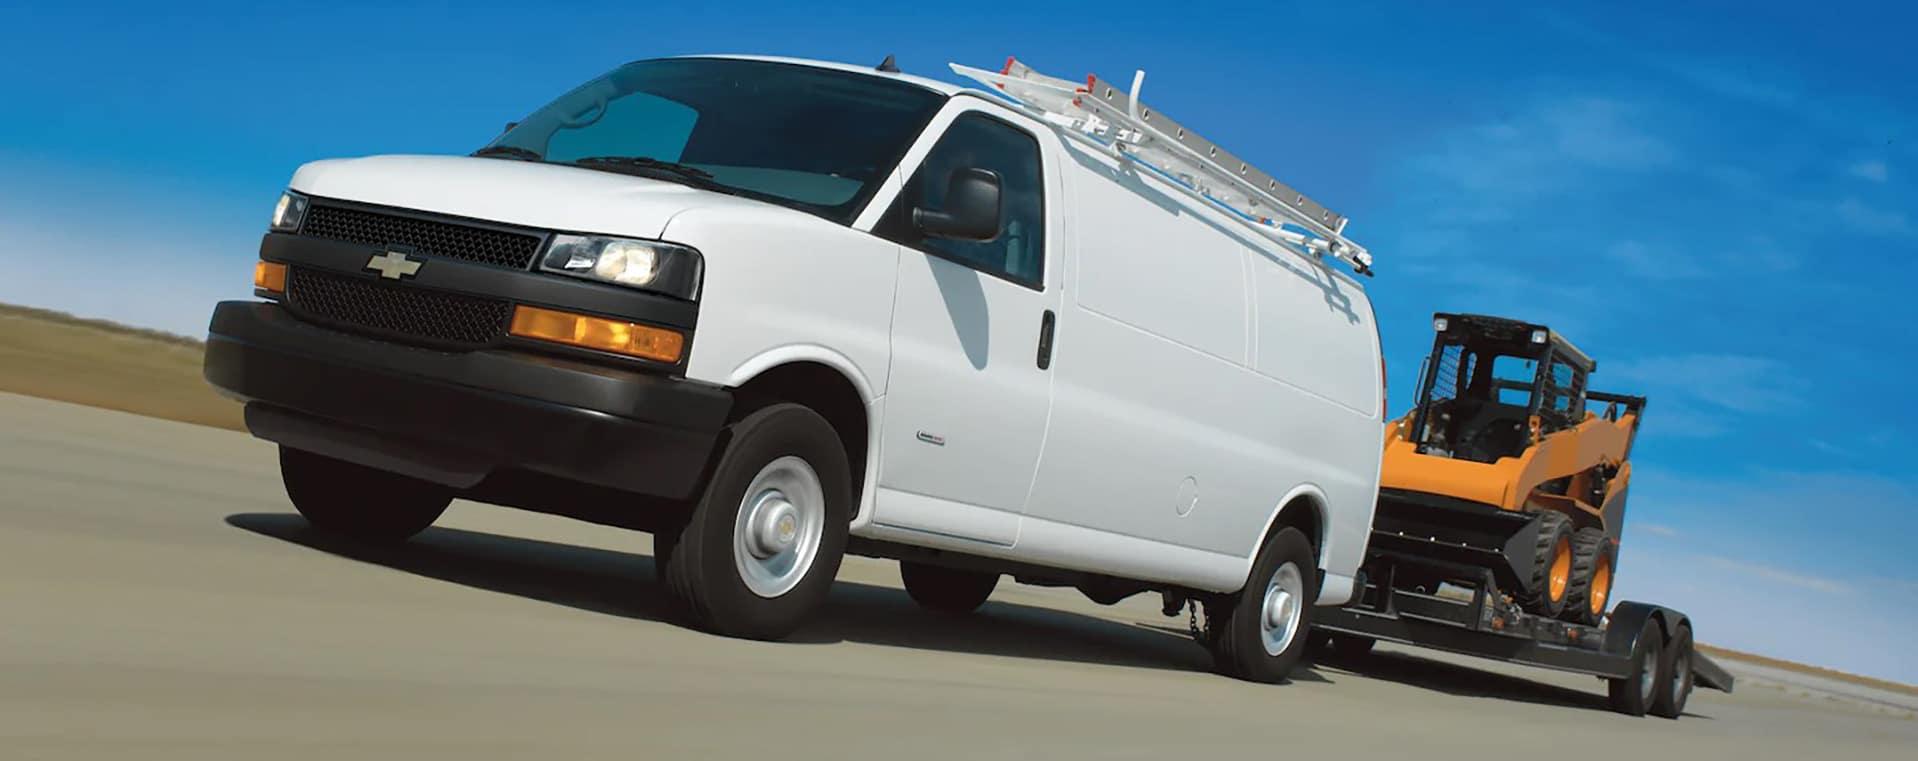 2021 Chevy Express Van near St. Louis